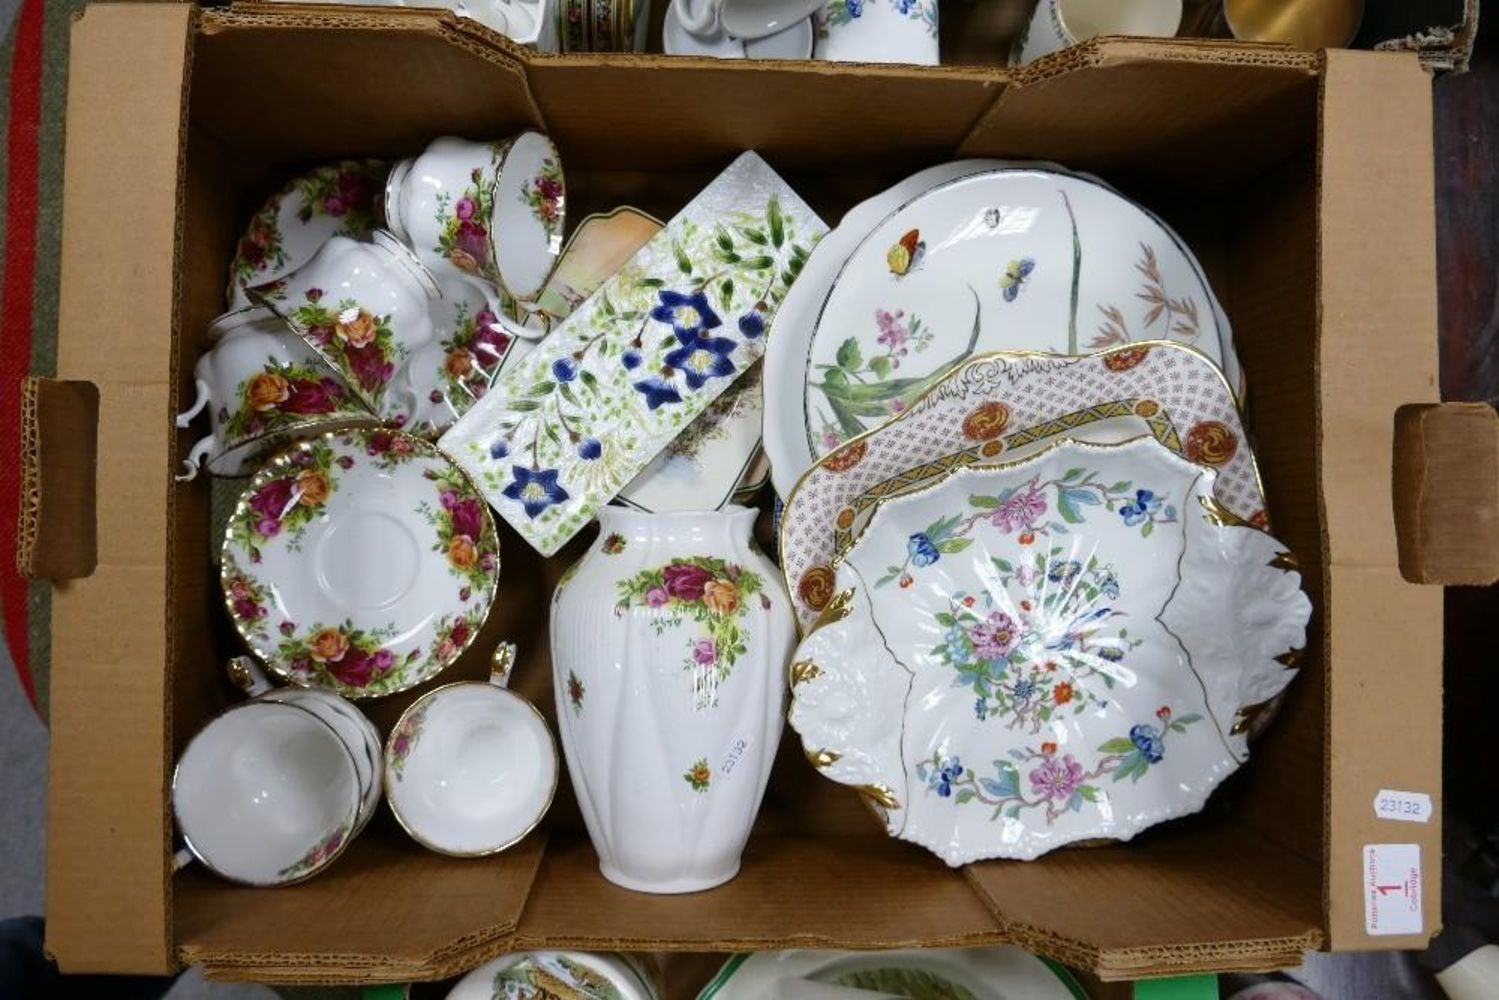 ONLINE Auction of Furniture, Tea ware, Collectors Items & Household Items - Cobridge Saleroom